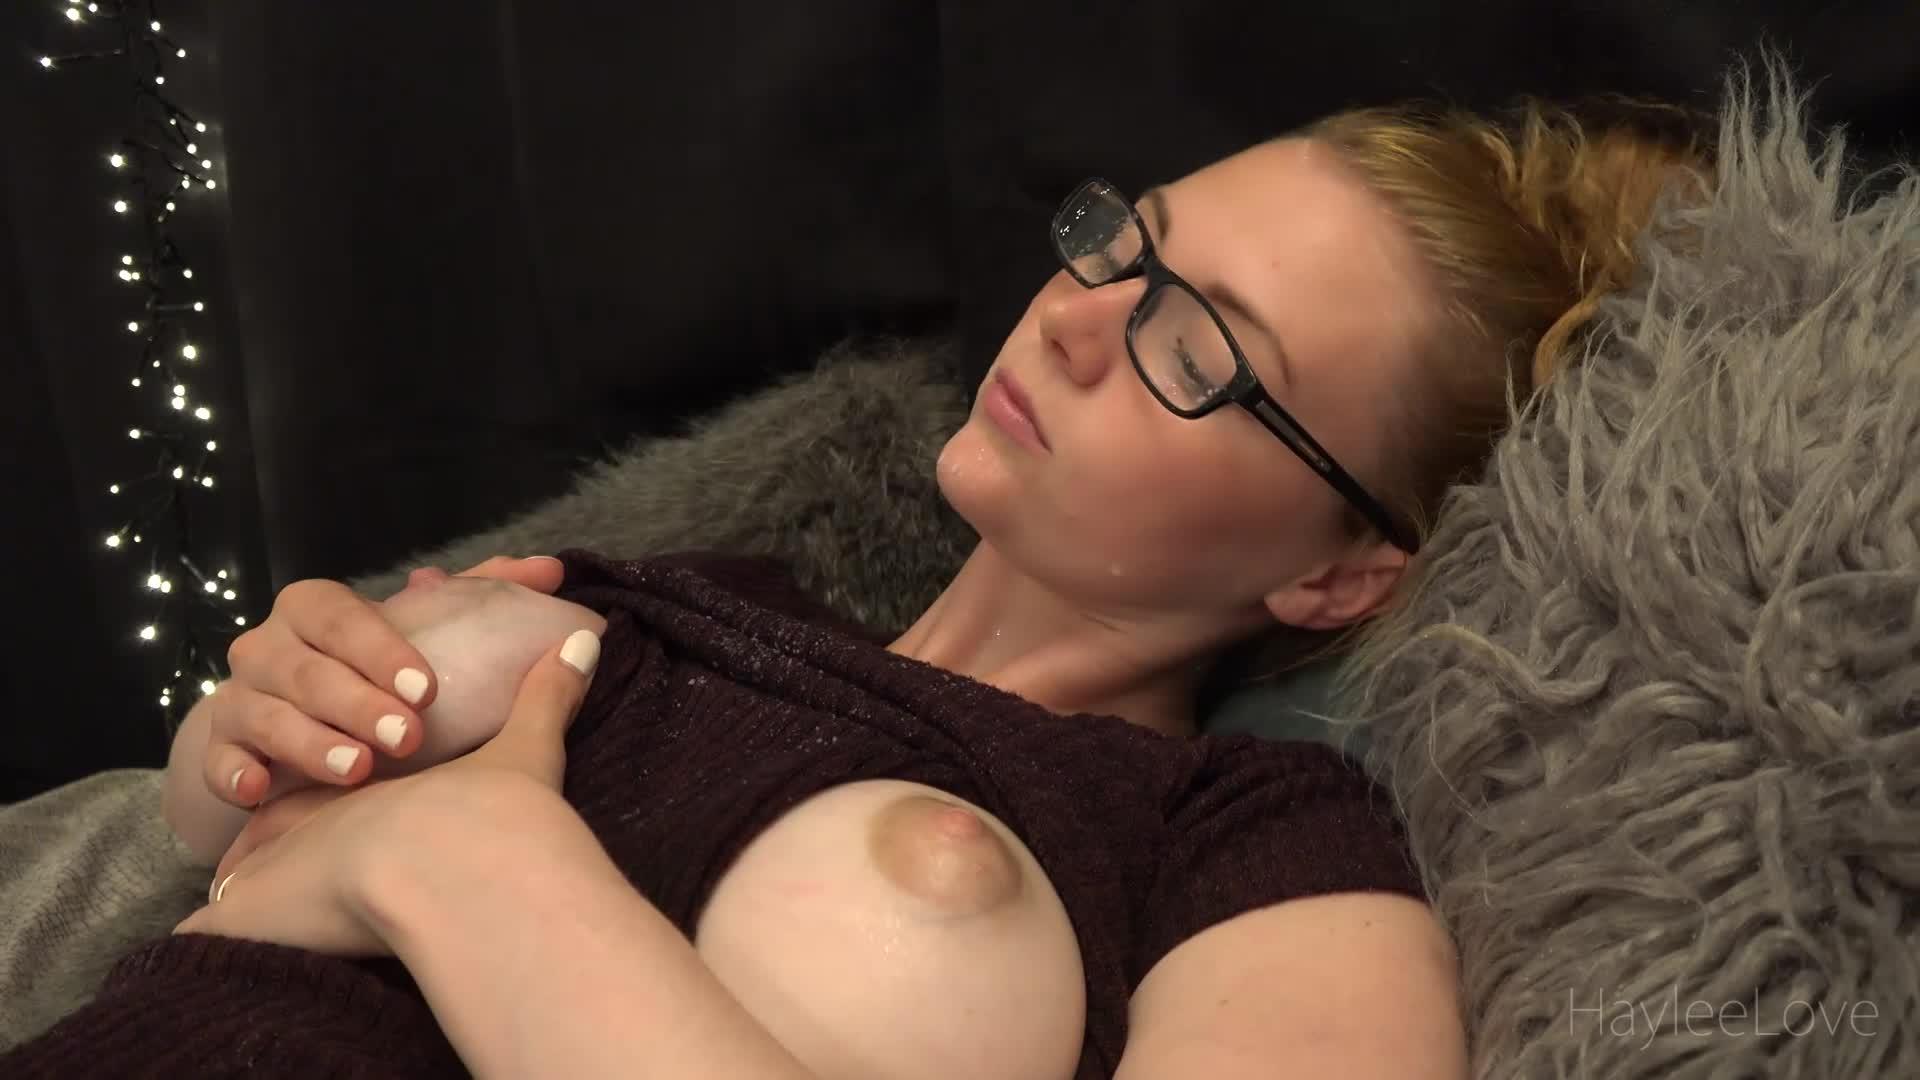 Extreme tit pump porno photo